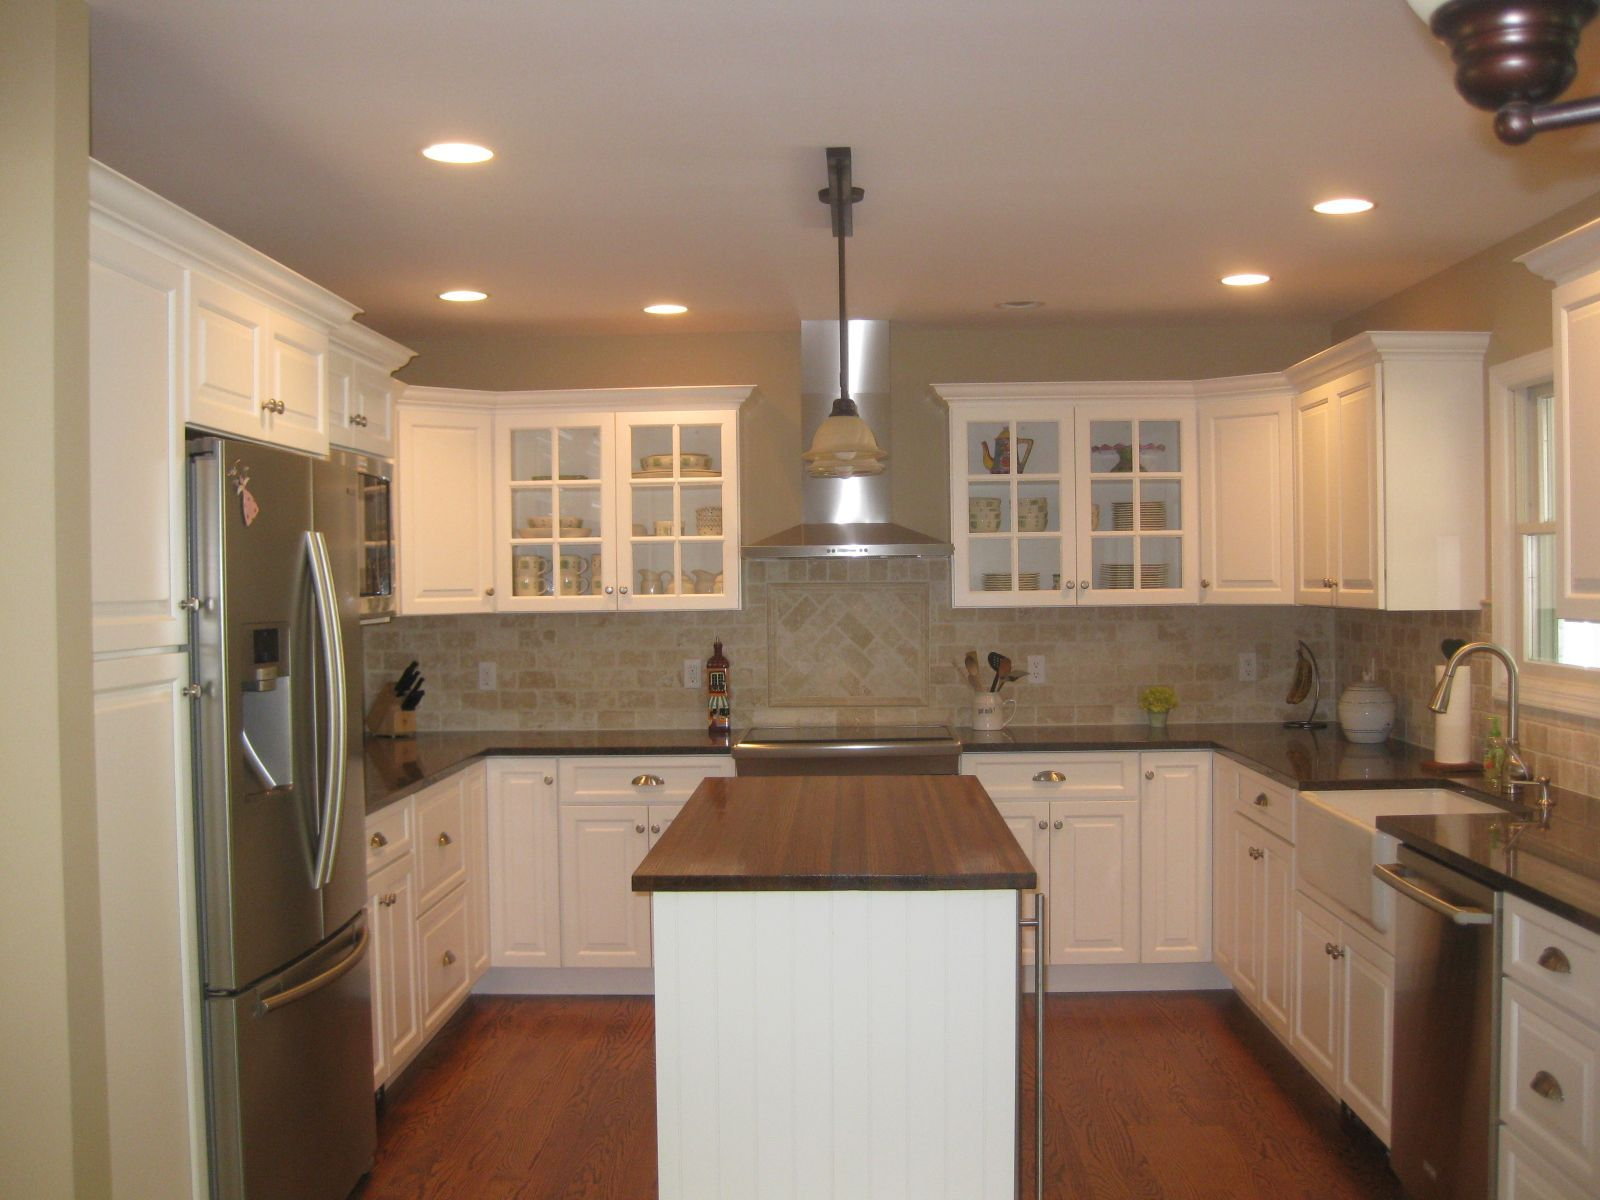 More ideas below KitchenRemodel KitchenIdeas Small U